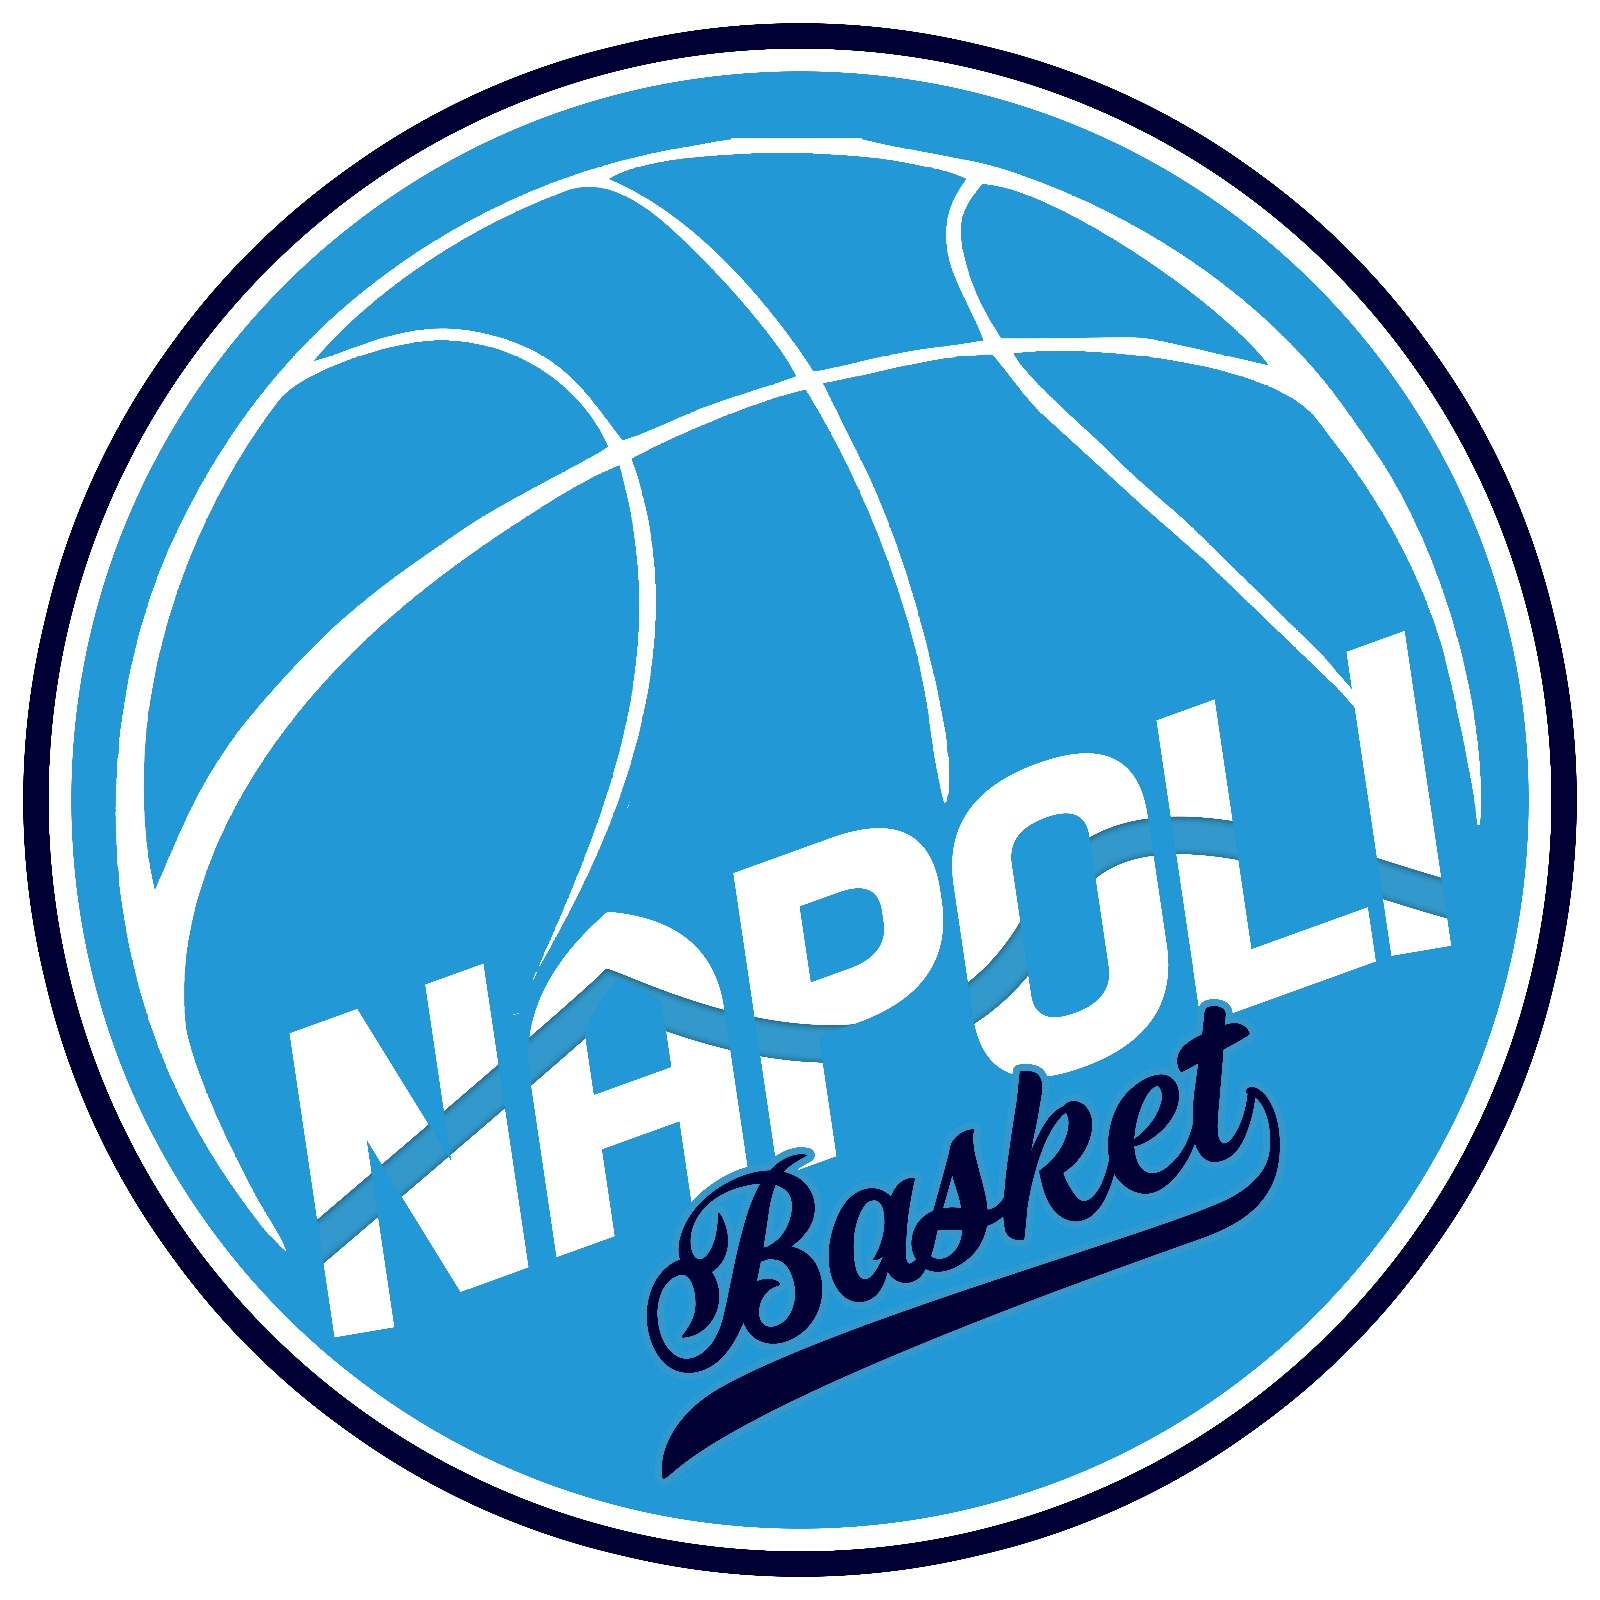 Napoli BasketOrari - Napoli Basket